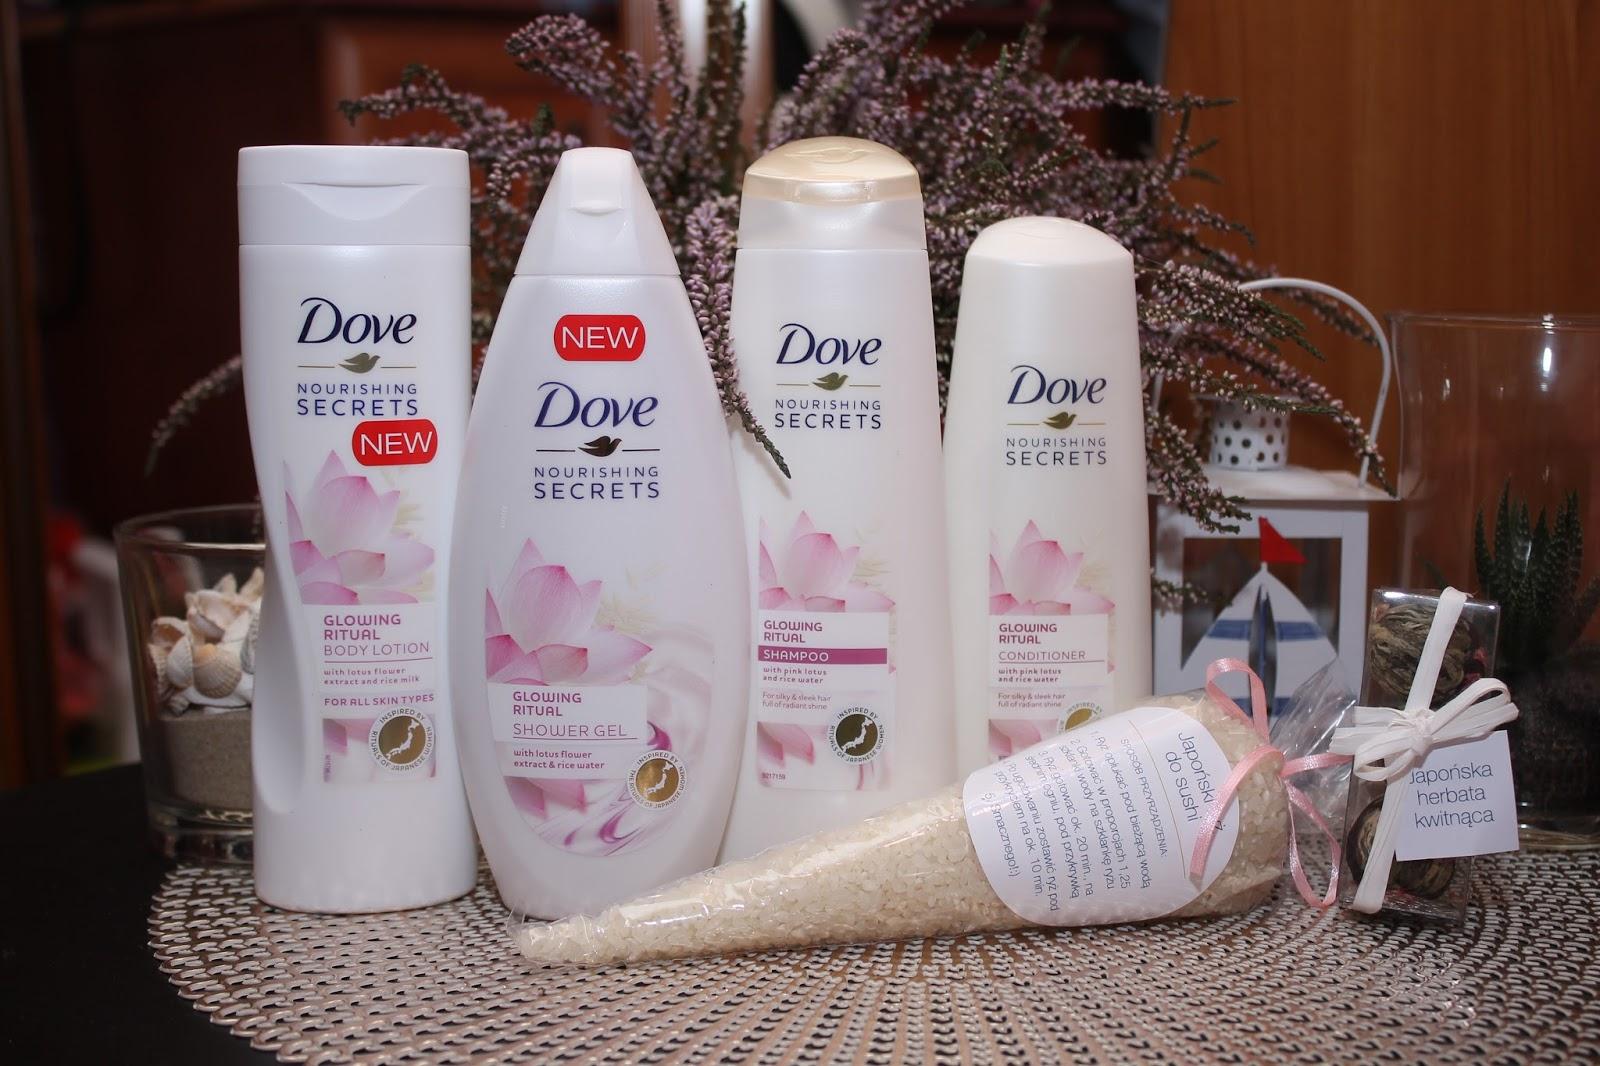 Japoński rytuał piękna - Dove Nourishing Secrets Glowing Ritual